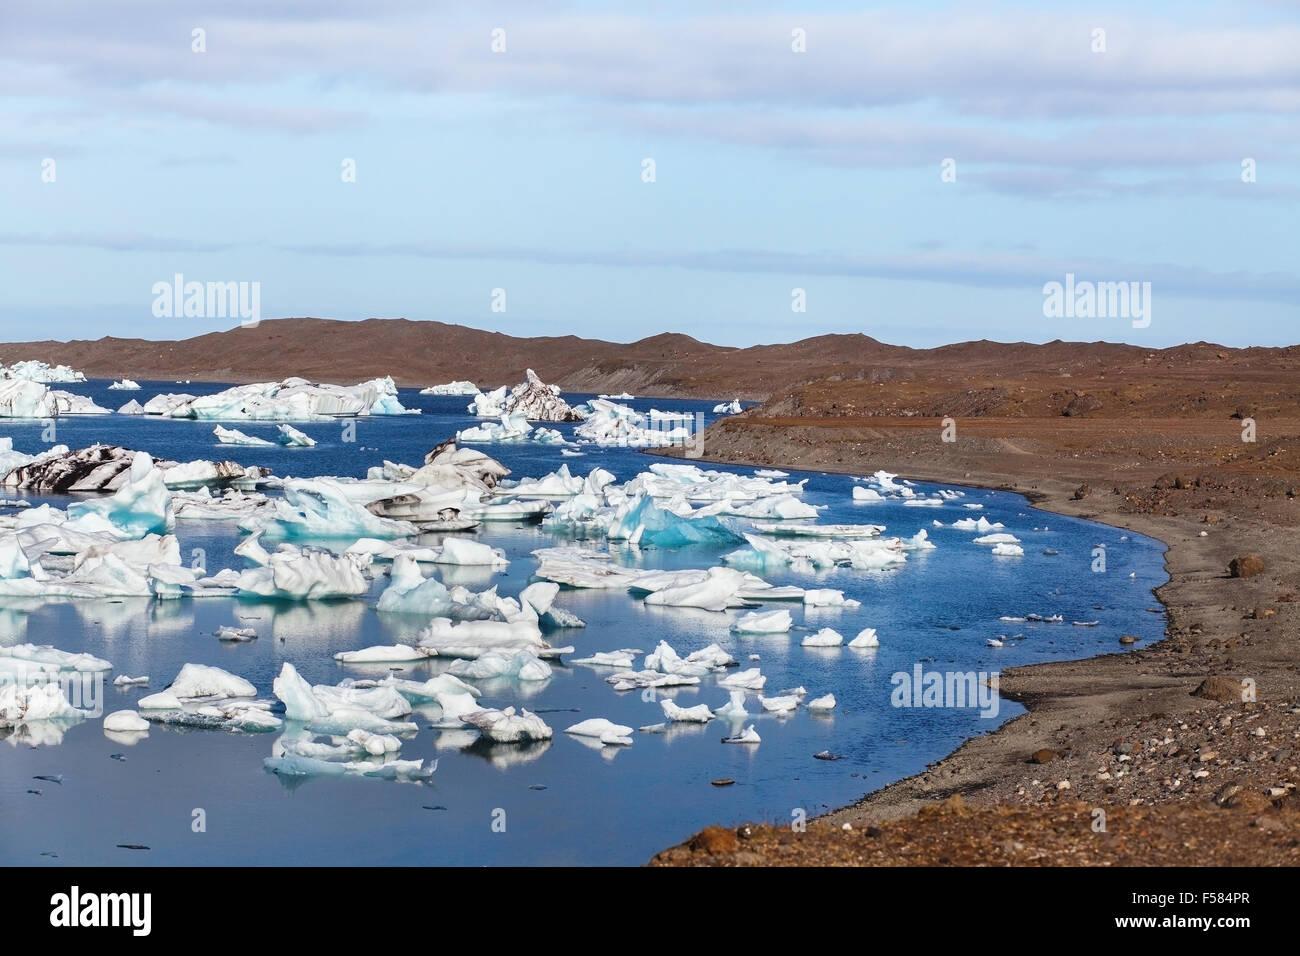 glacier lake, surreal landscape from Iceland - Stock Image